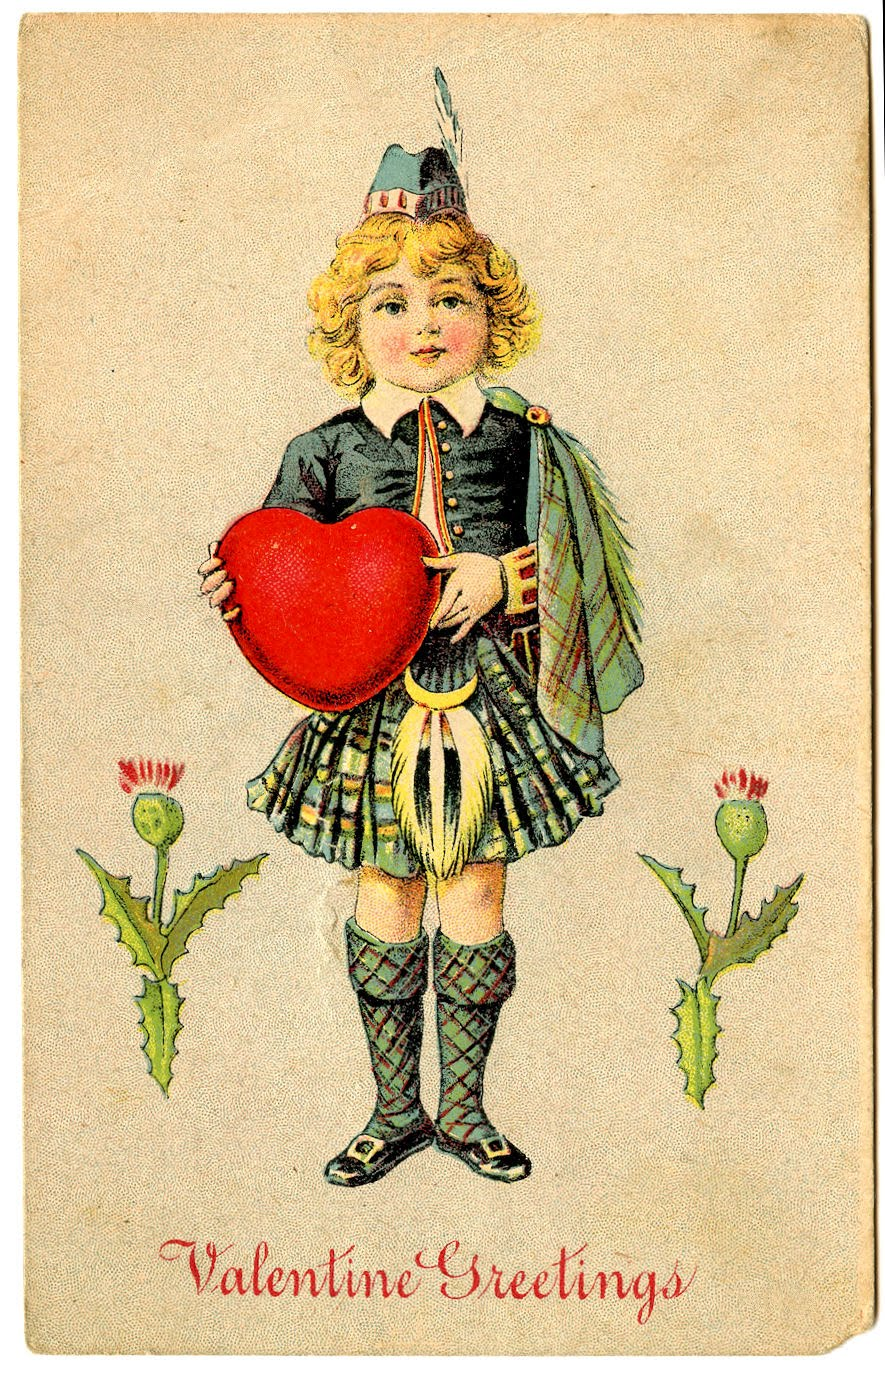 Free Valentine's Day Clip Art - Vintage Postcards - The ...